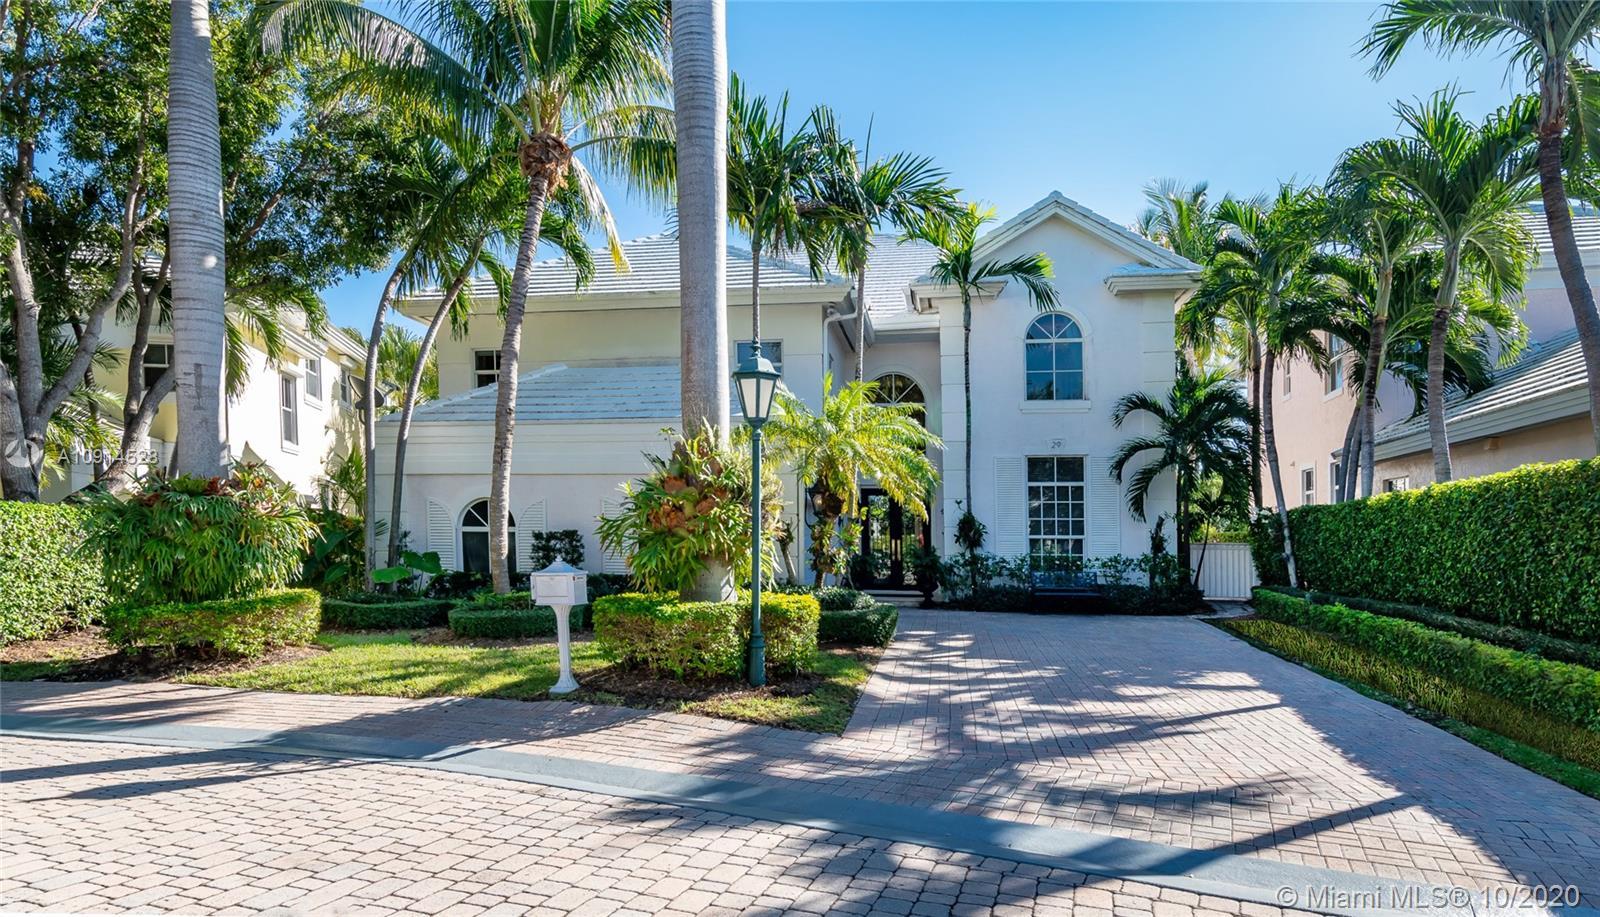 29  Grand Bay Estates Cir #29 For Sale A10914528, FL